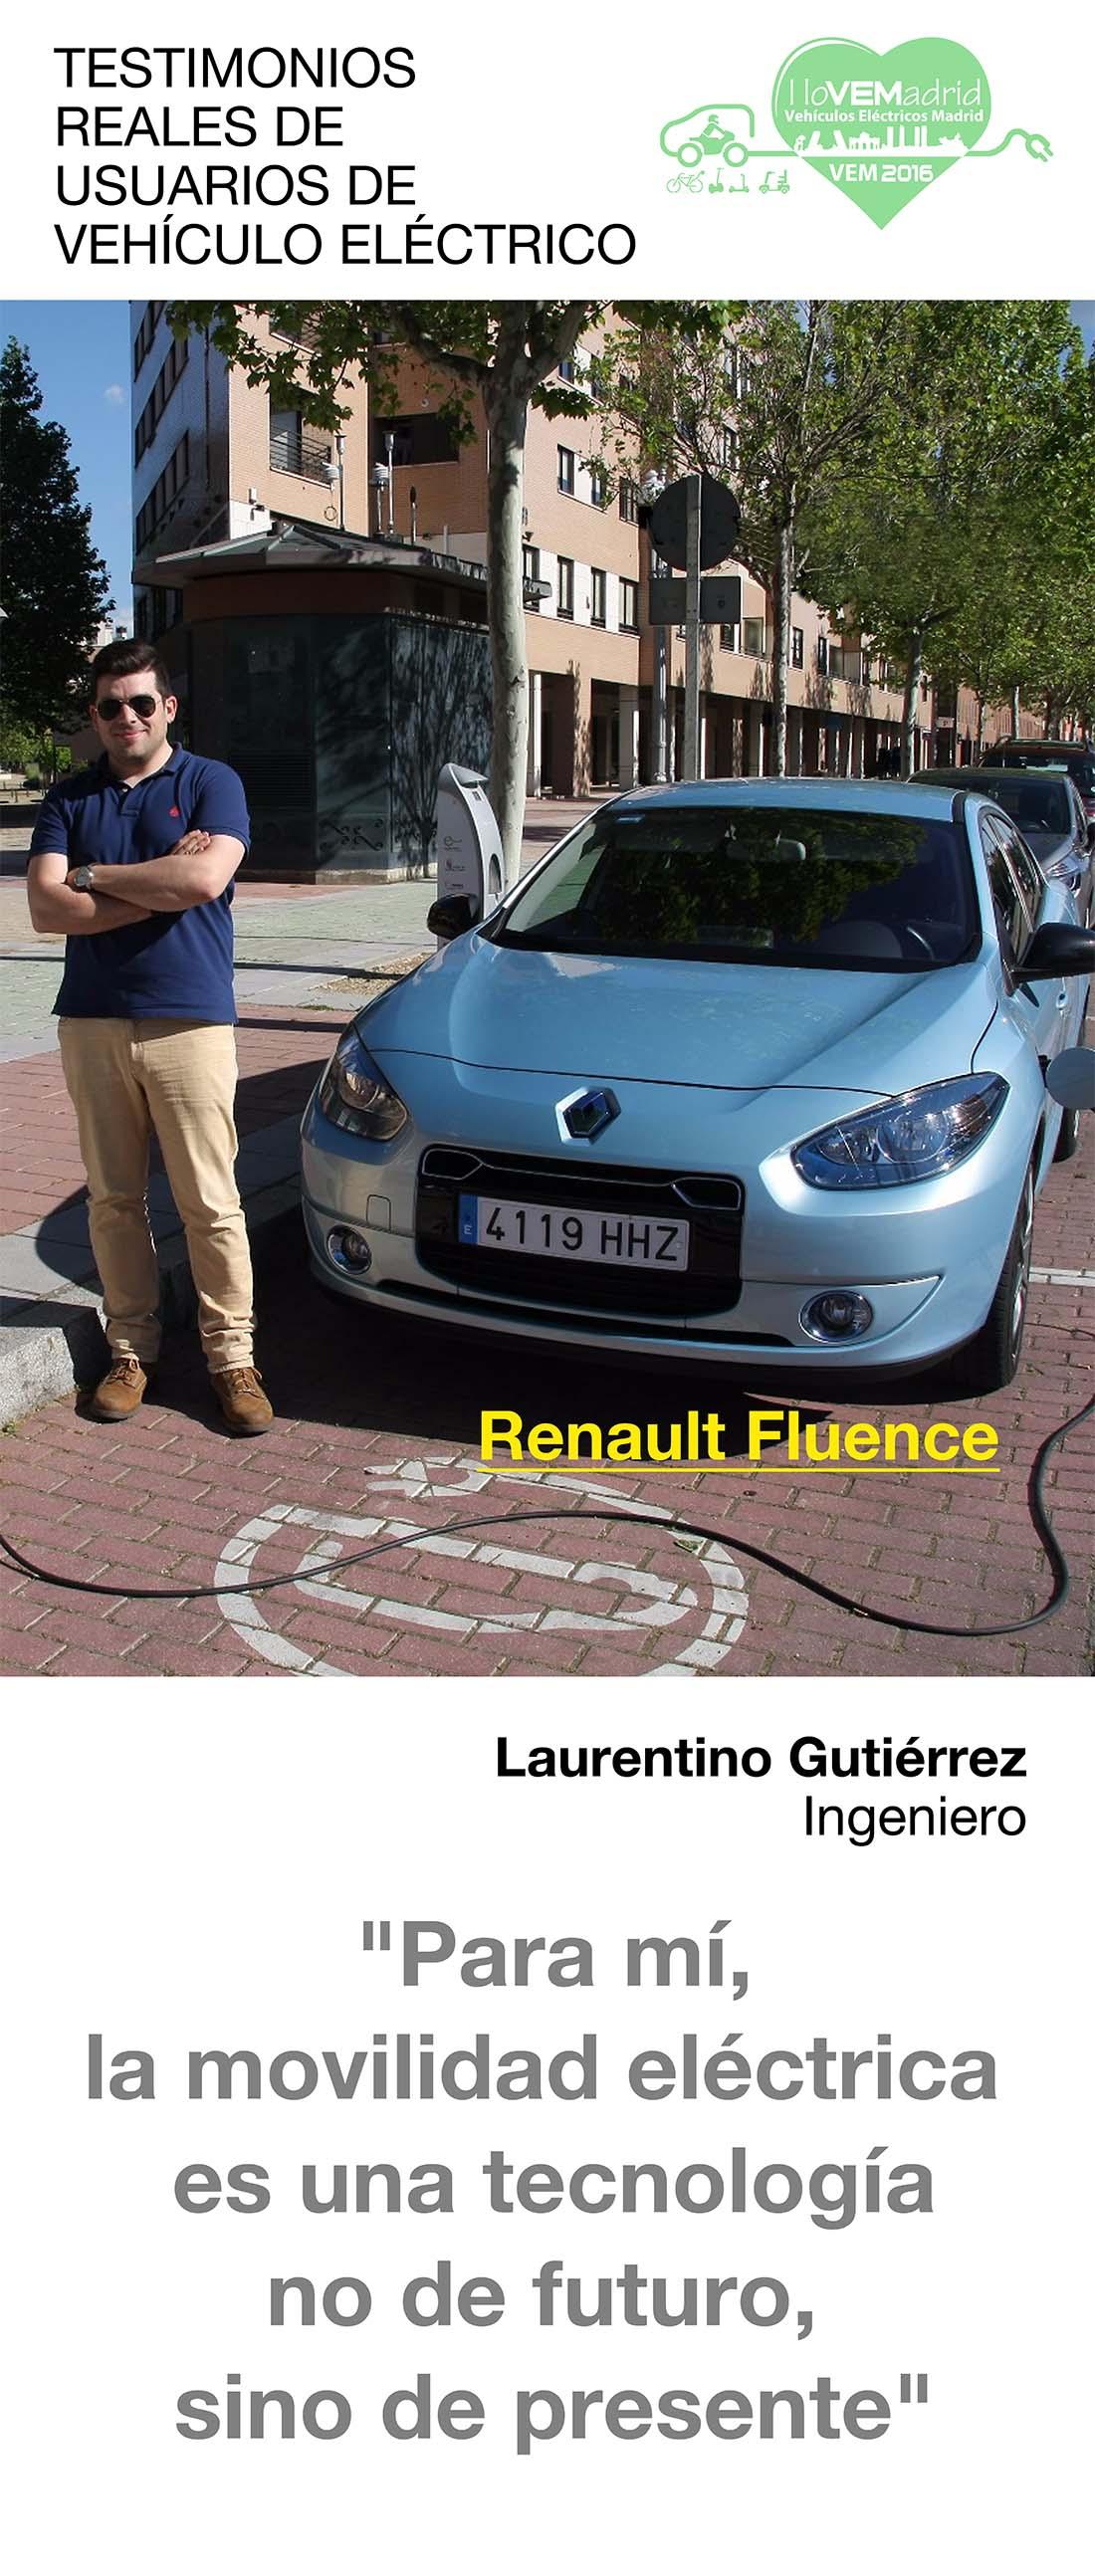 Laurentino Gutiérrez